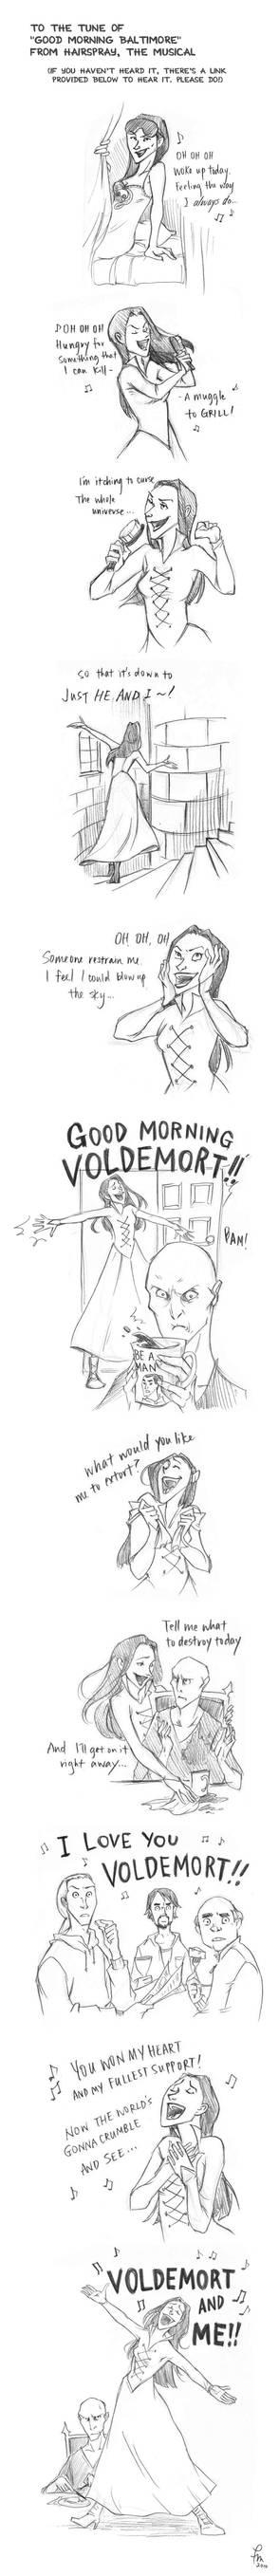 Good Morning Voldemort